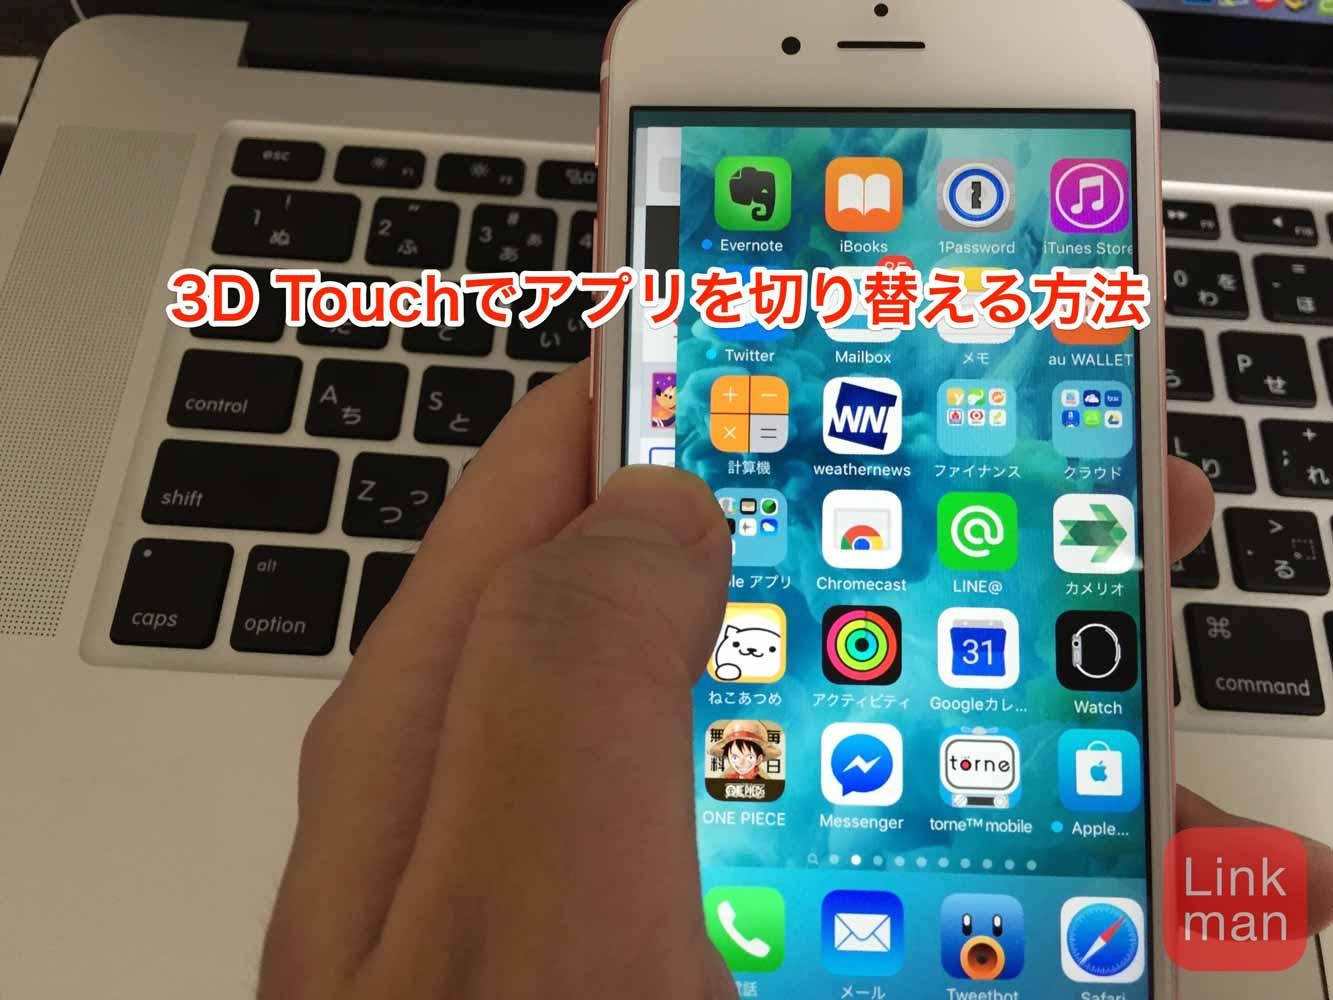 iPhone 6s/6s Plus:3D Touchでアプリを切り替える方法【使い方】